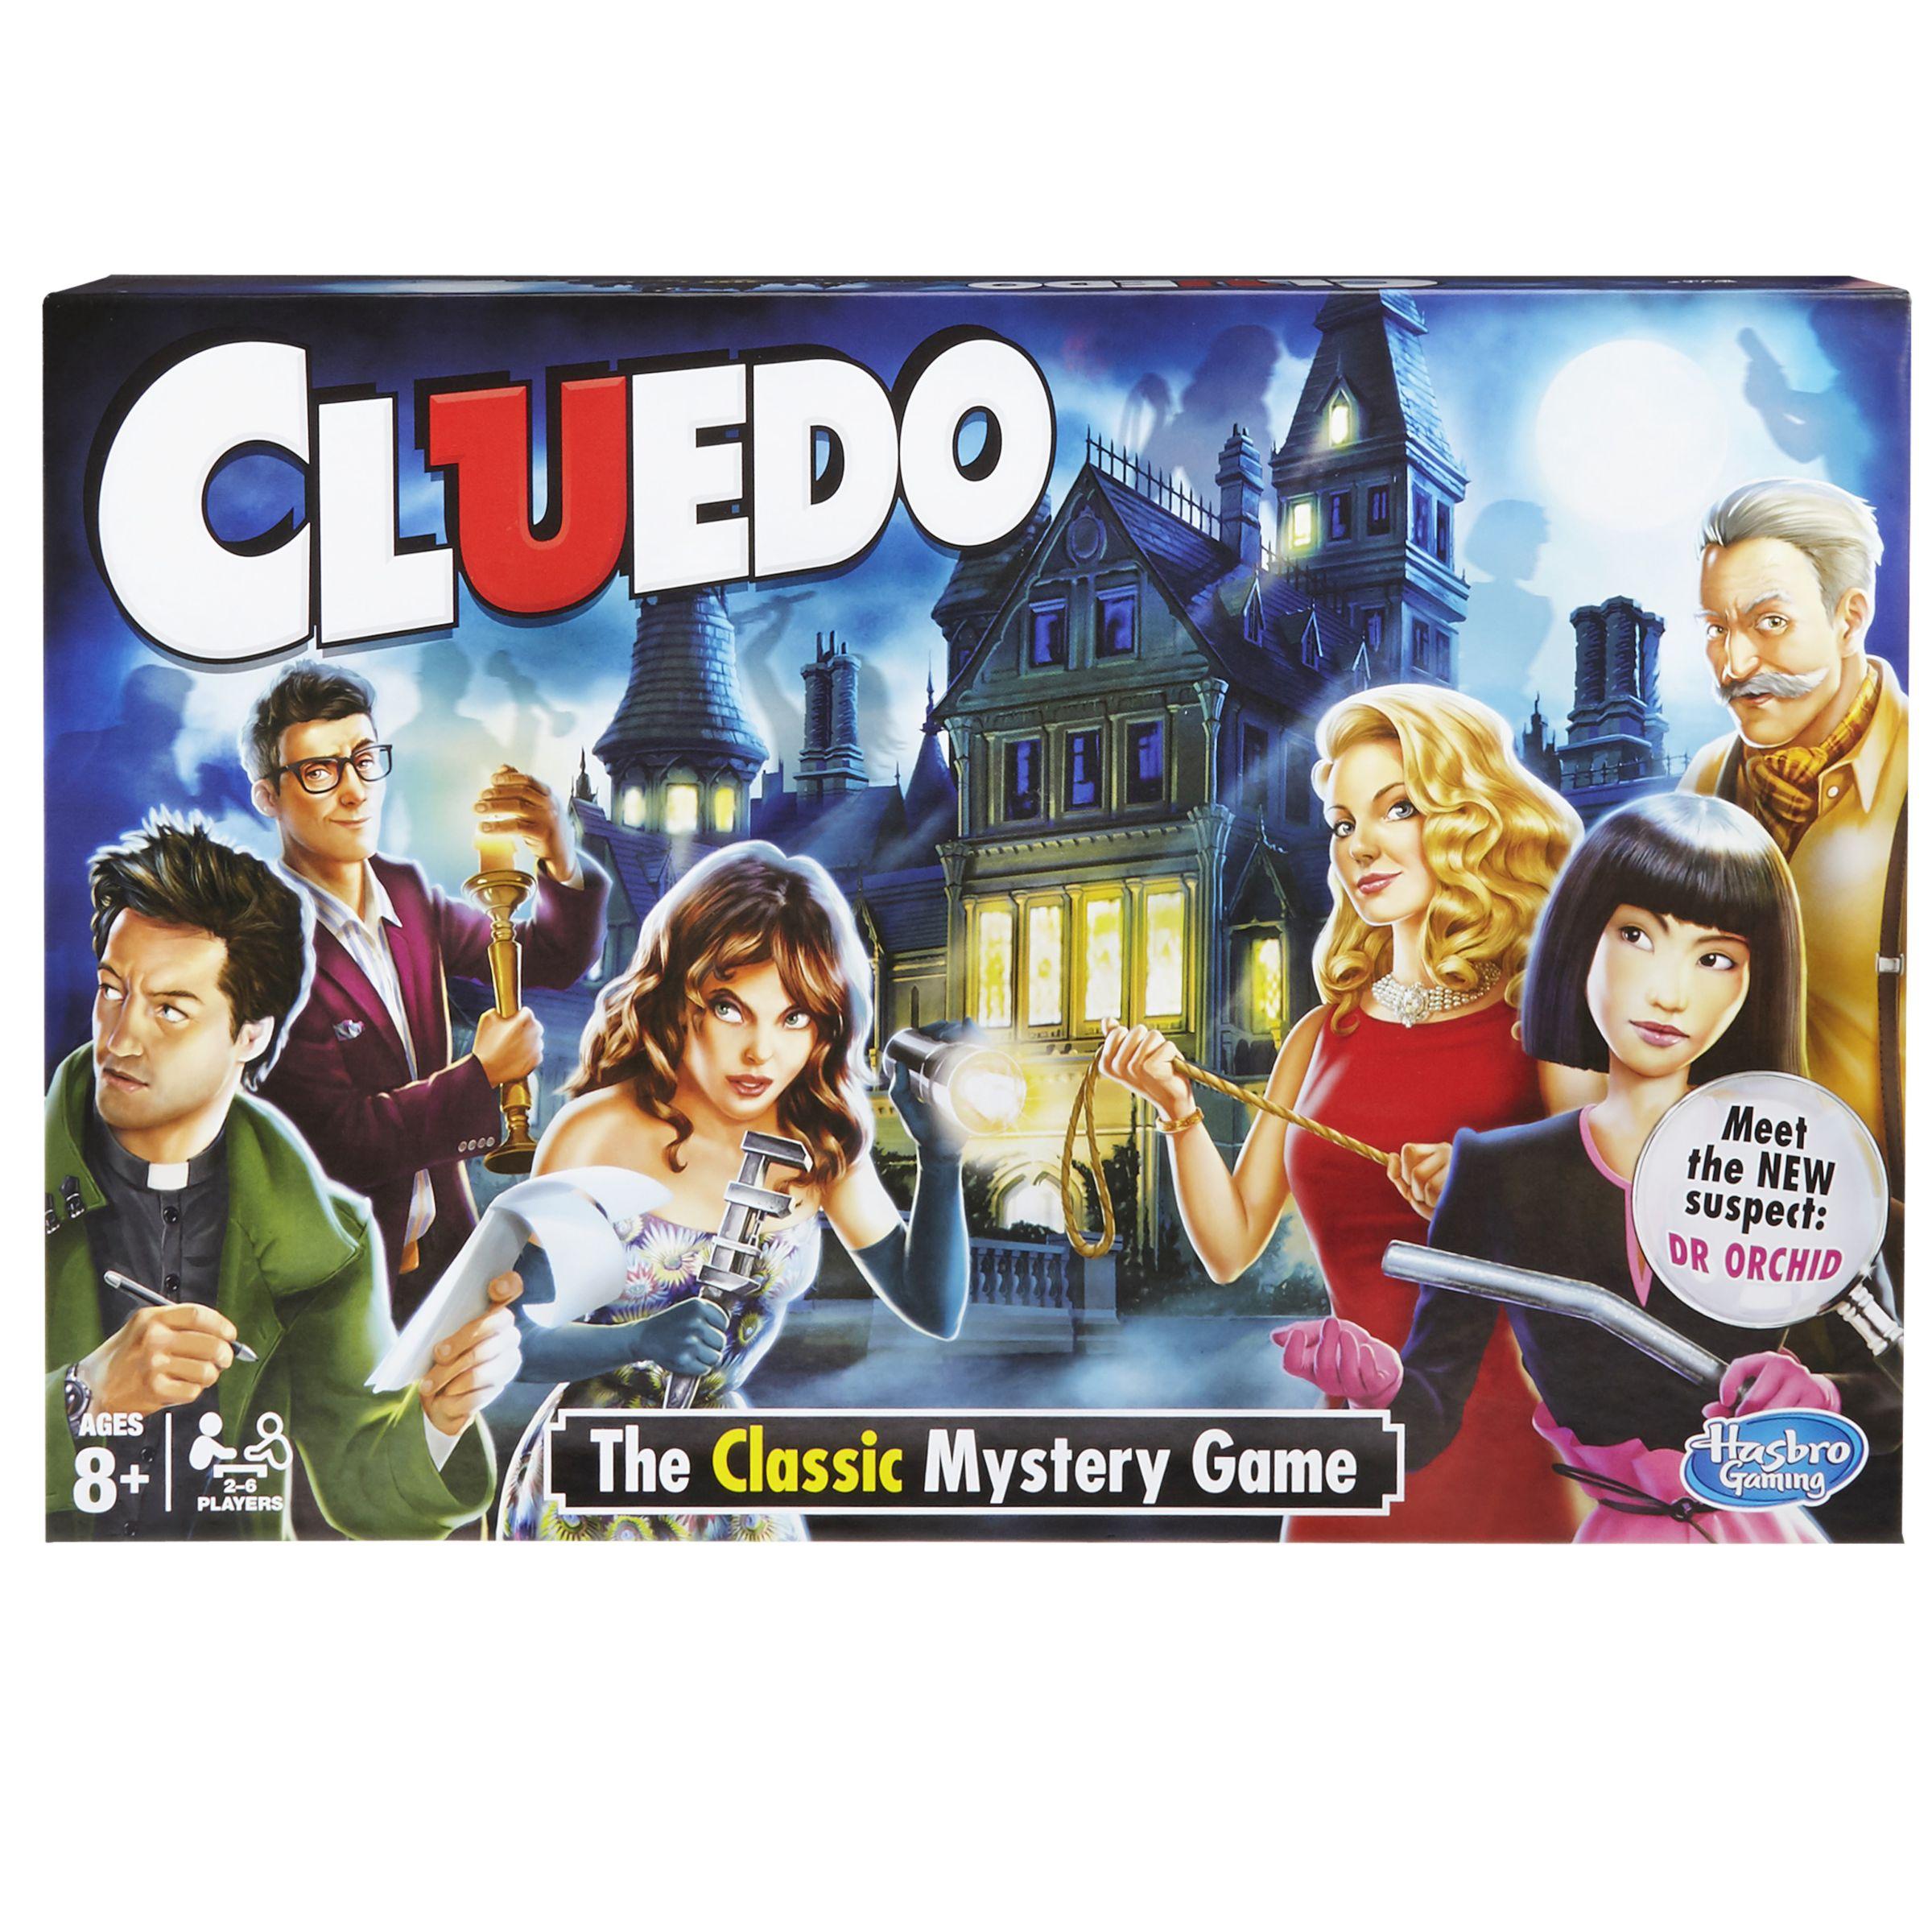 Cluedo Mystery